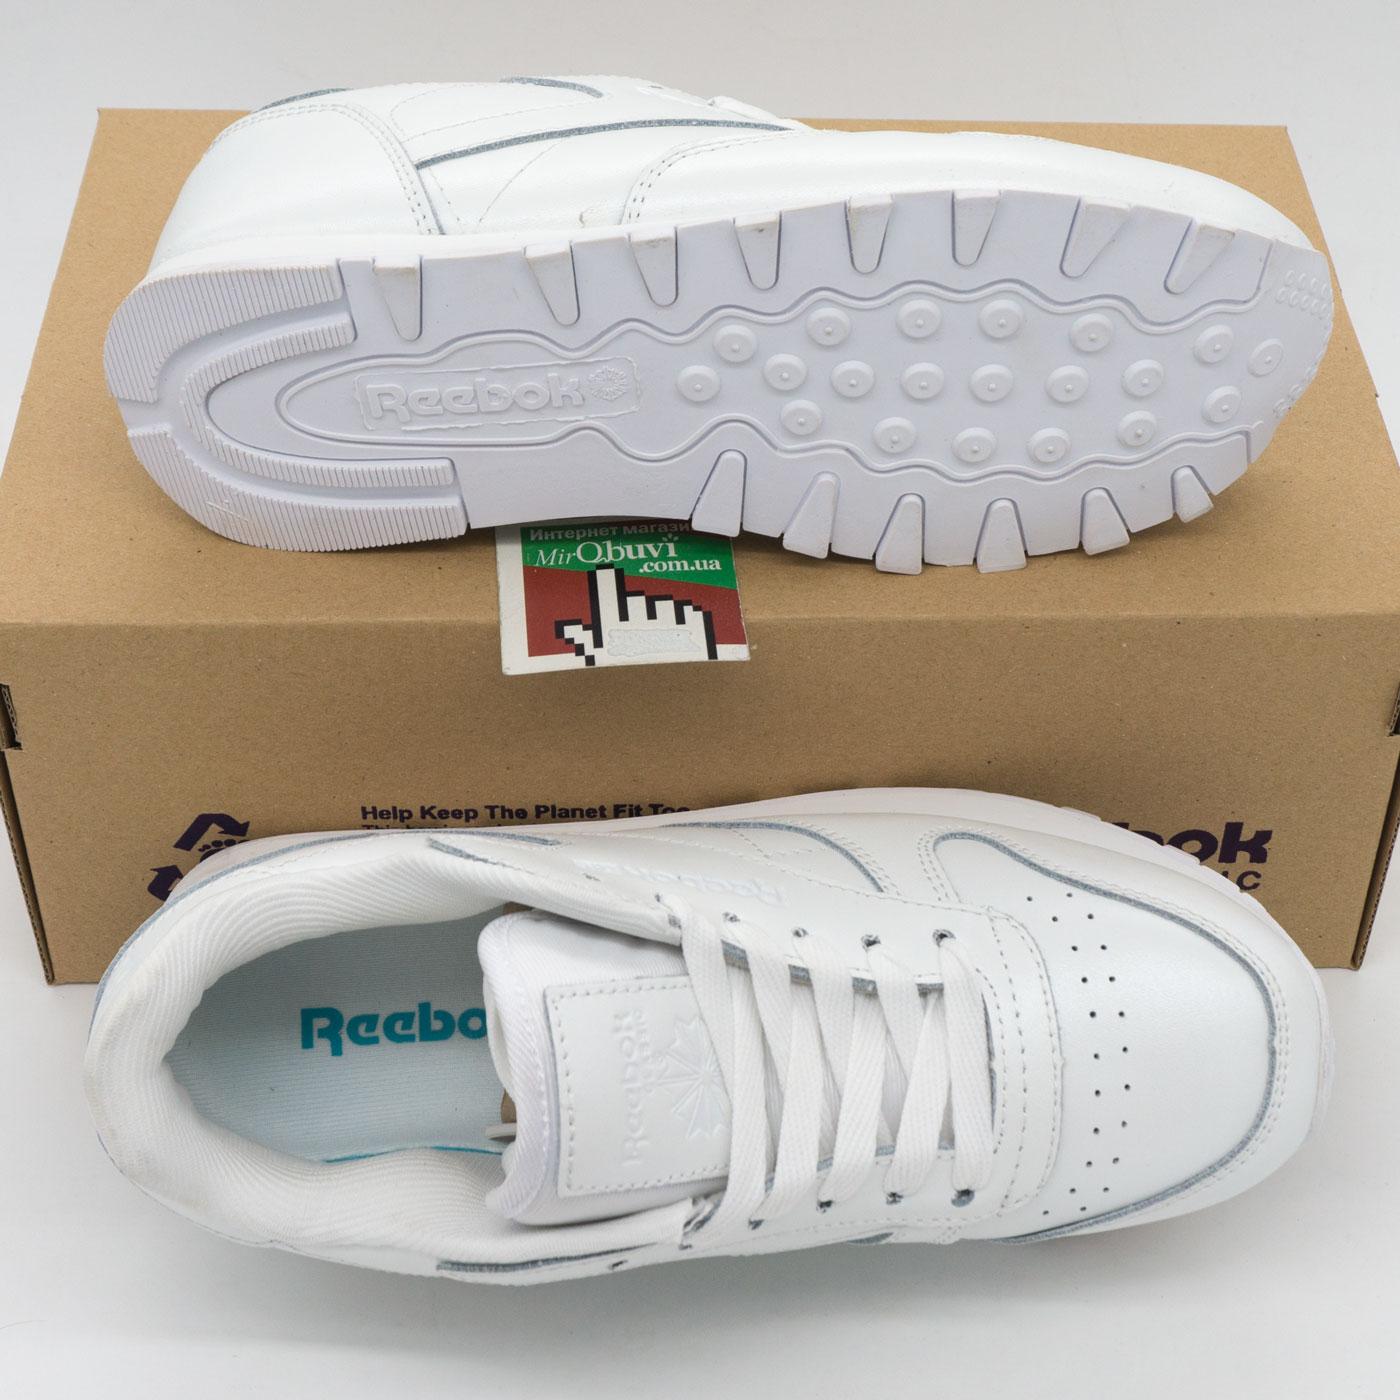 фото bottom Женские кроссовки Reebok classic leather white (Рибок класик белые, кожа) bottom